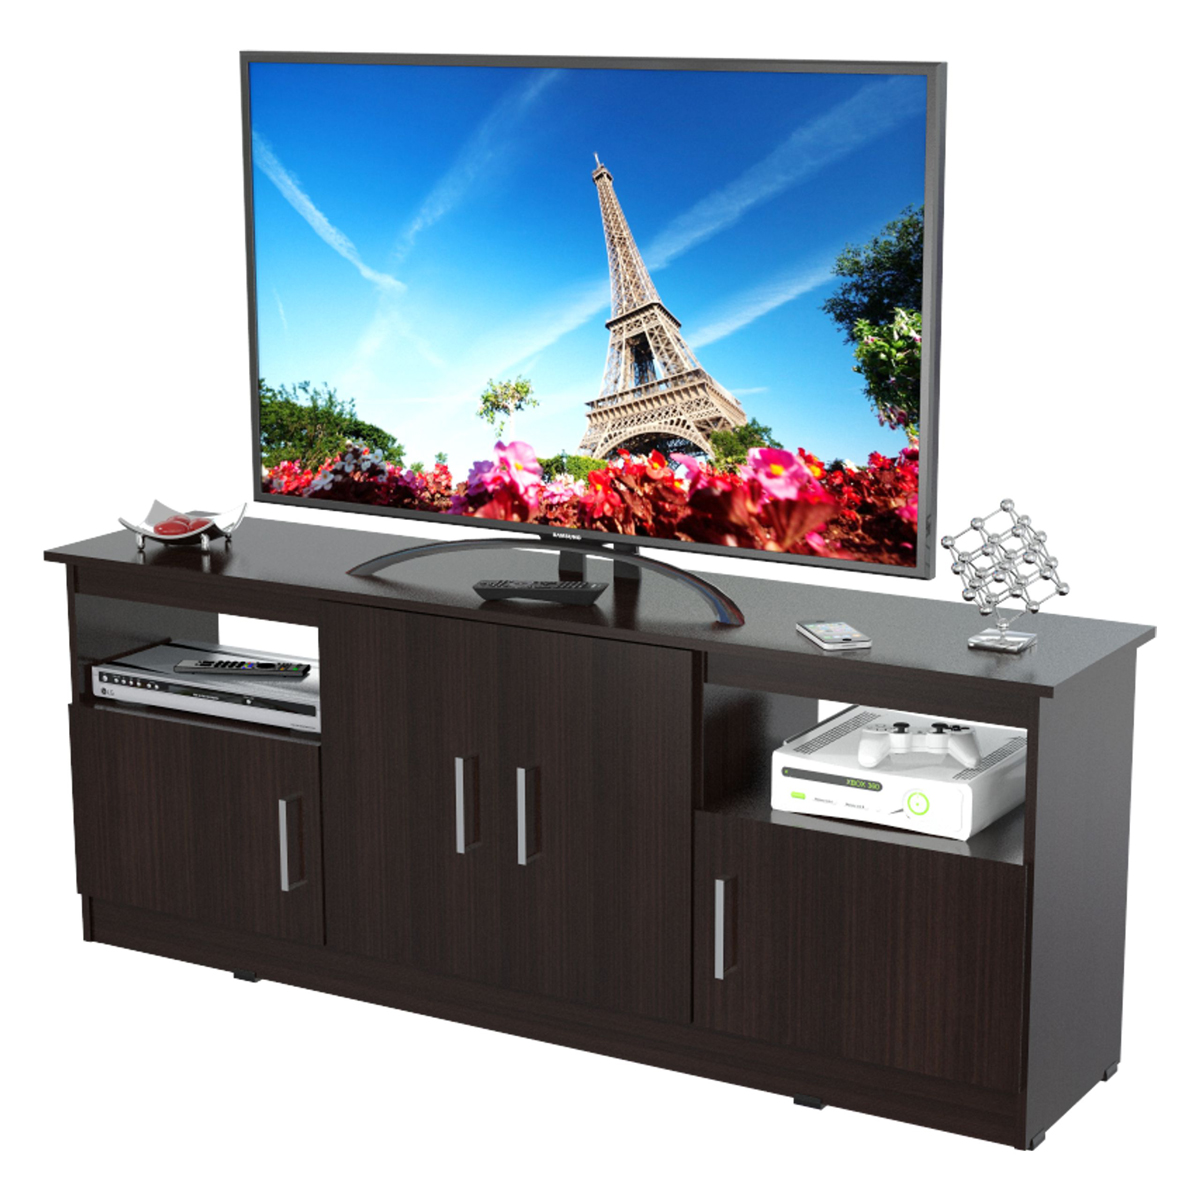 inval contemporary 60 flat screen tv stand espresso wengue. Black Bedroom Furniture Sets. Home Design Ideas